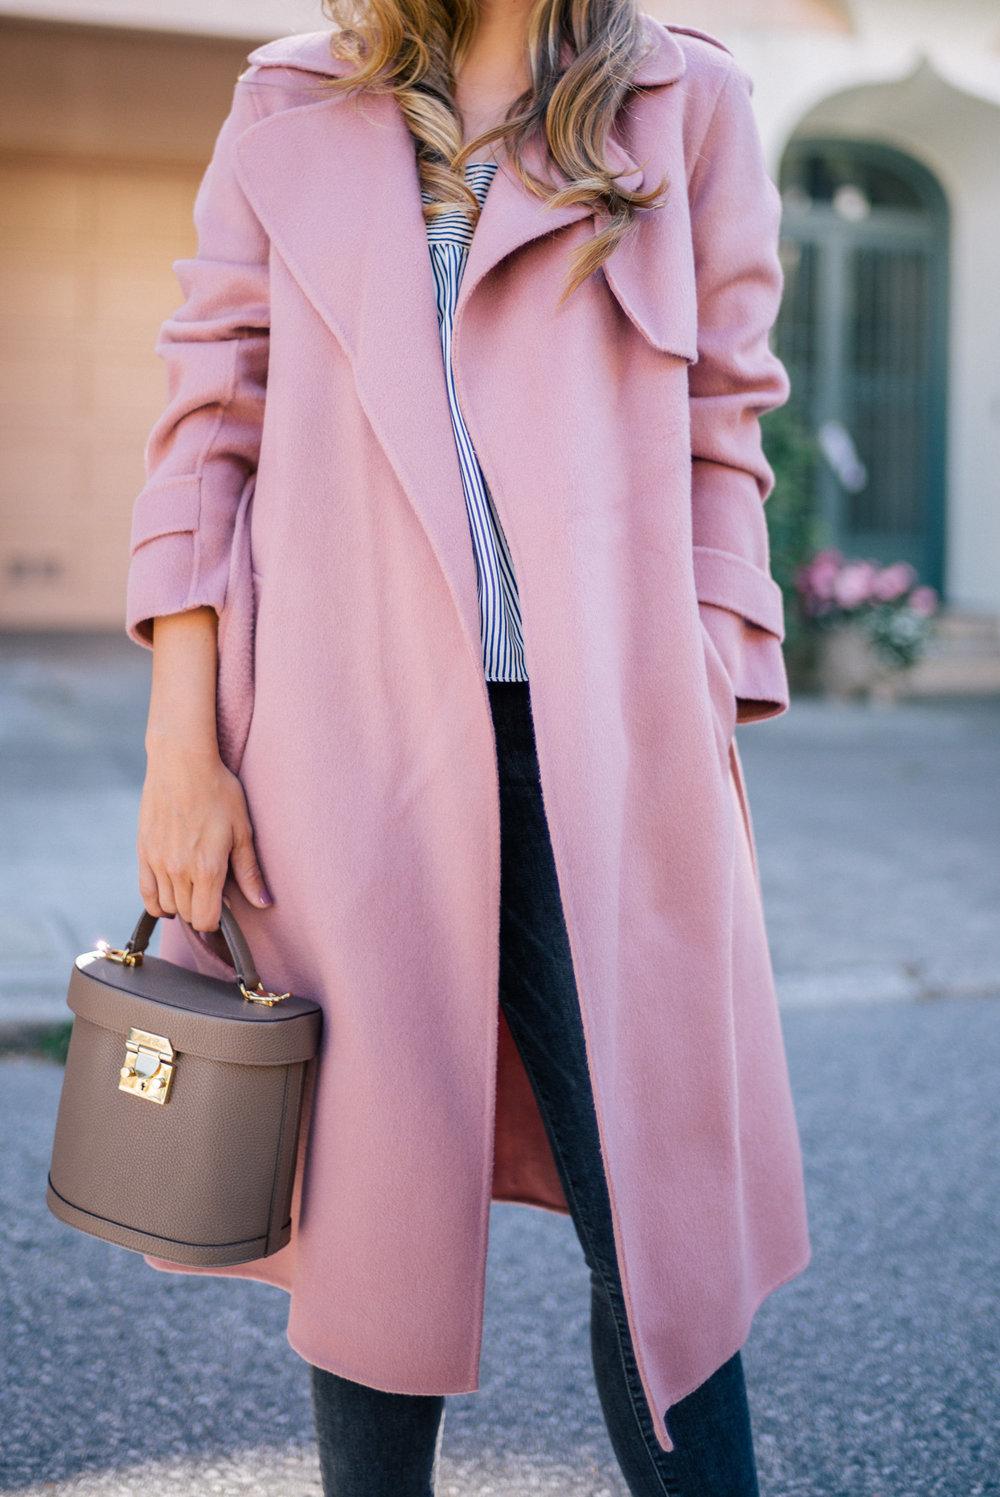 gmg-pink-fall-coat-1009848.jpg